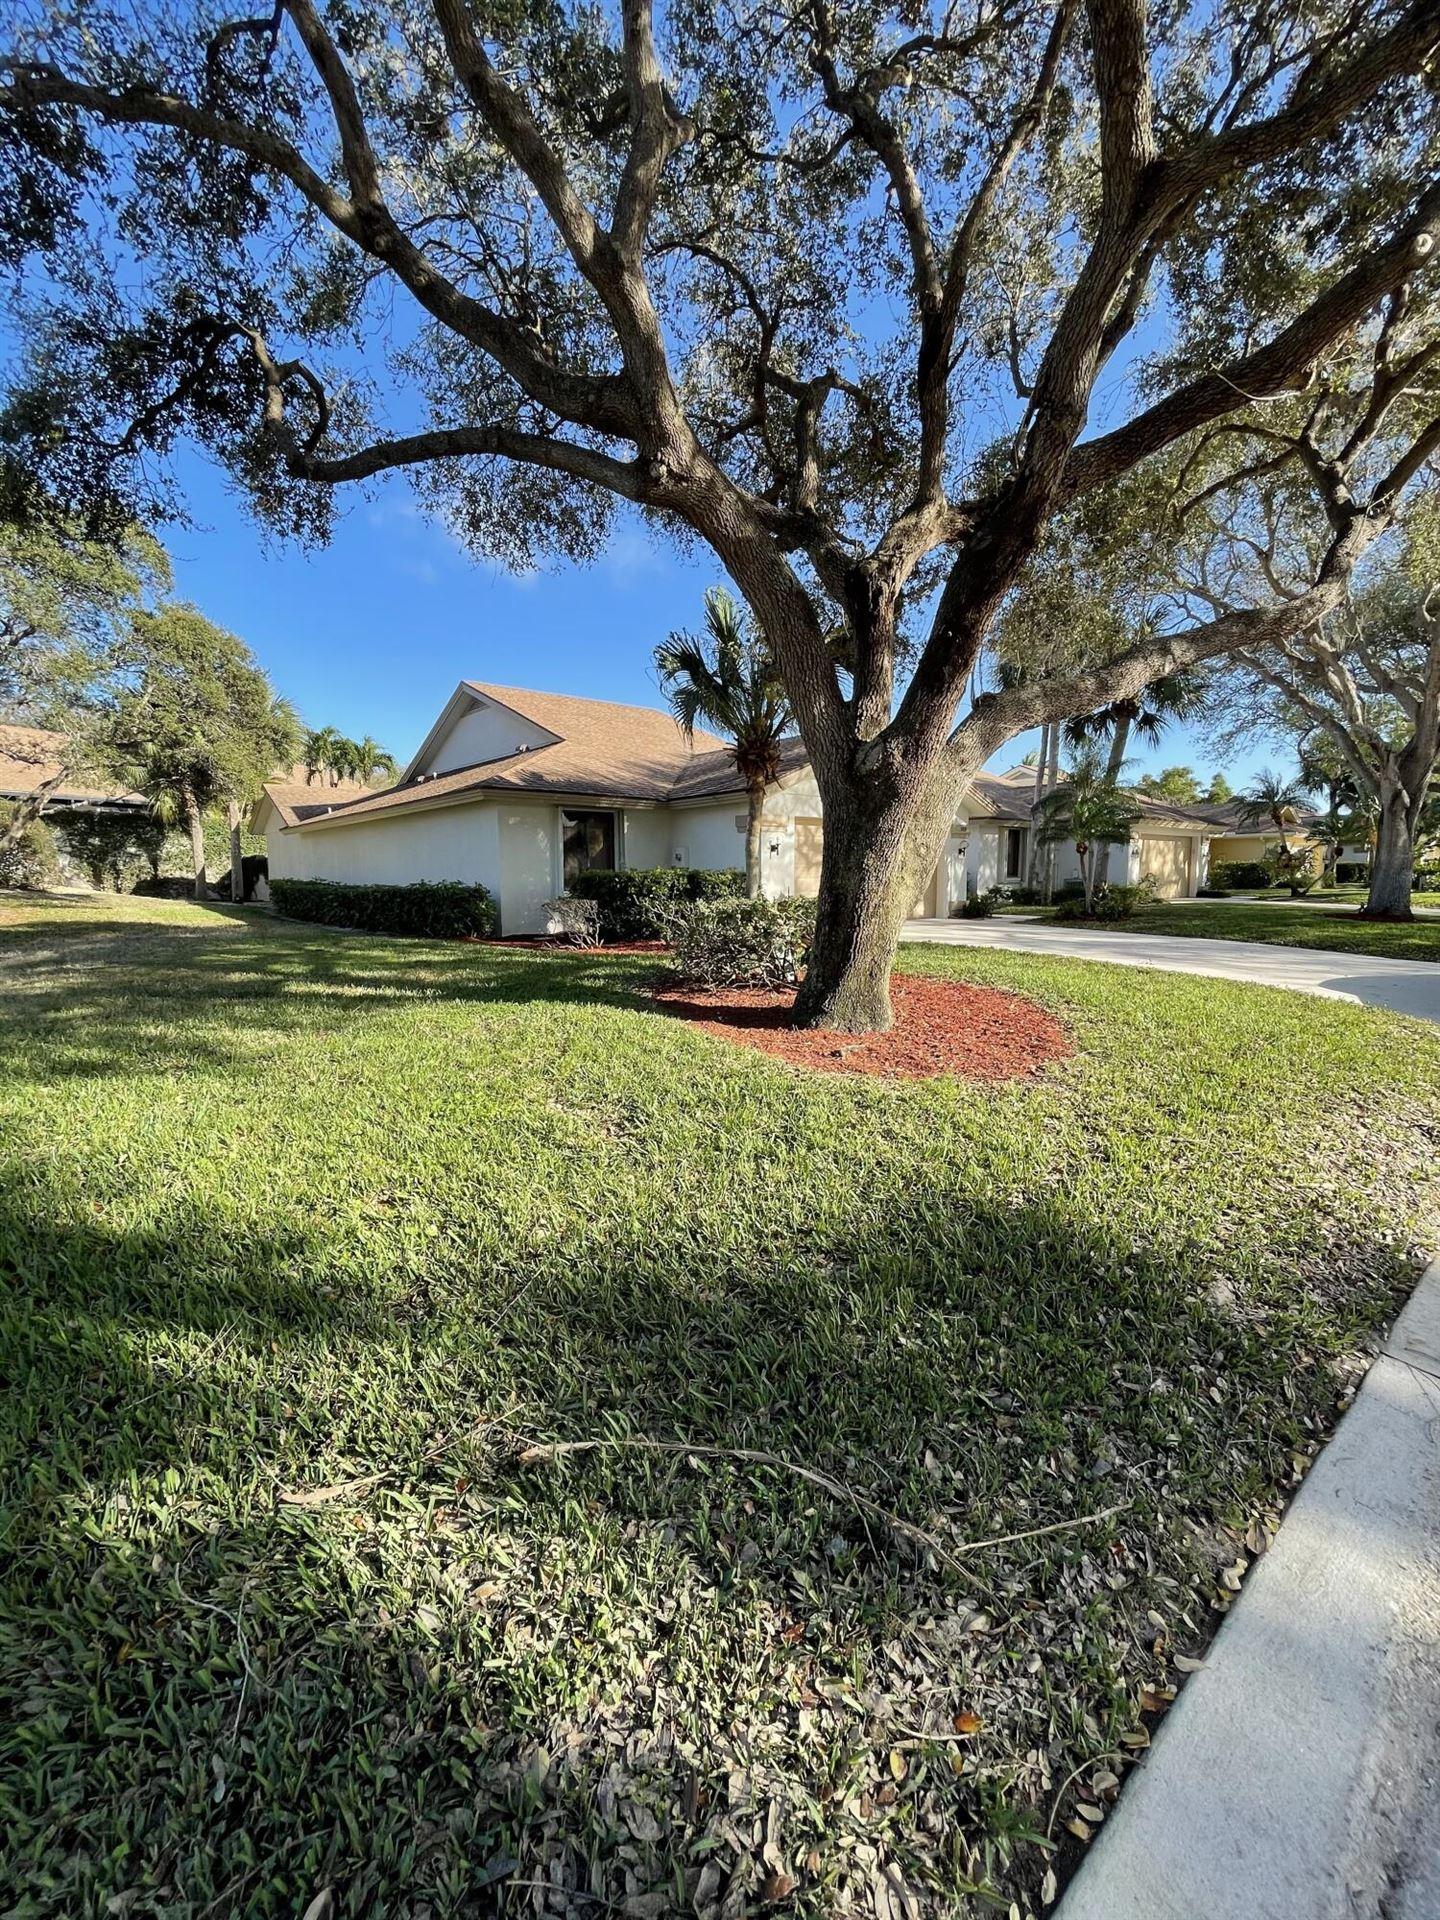 Photo of 149 Cape Pointe Circle, Jupiter, FL 33477 (MLS # RX-10697756)